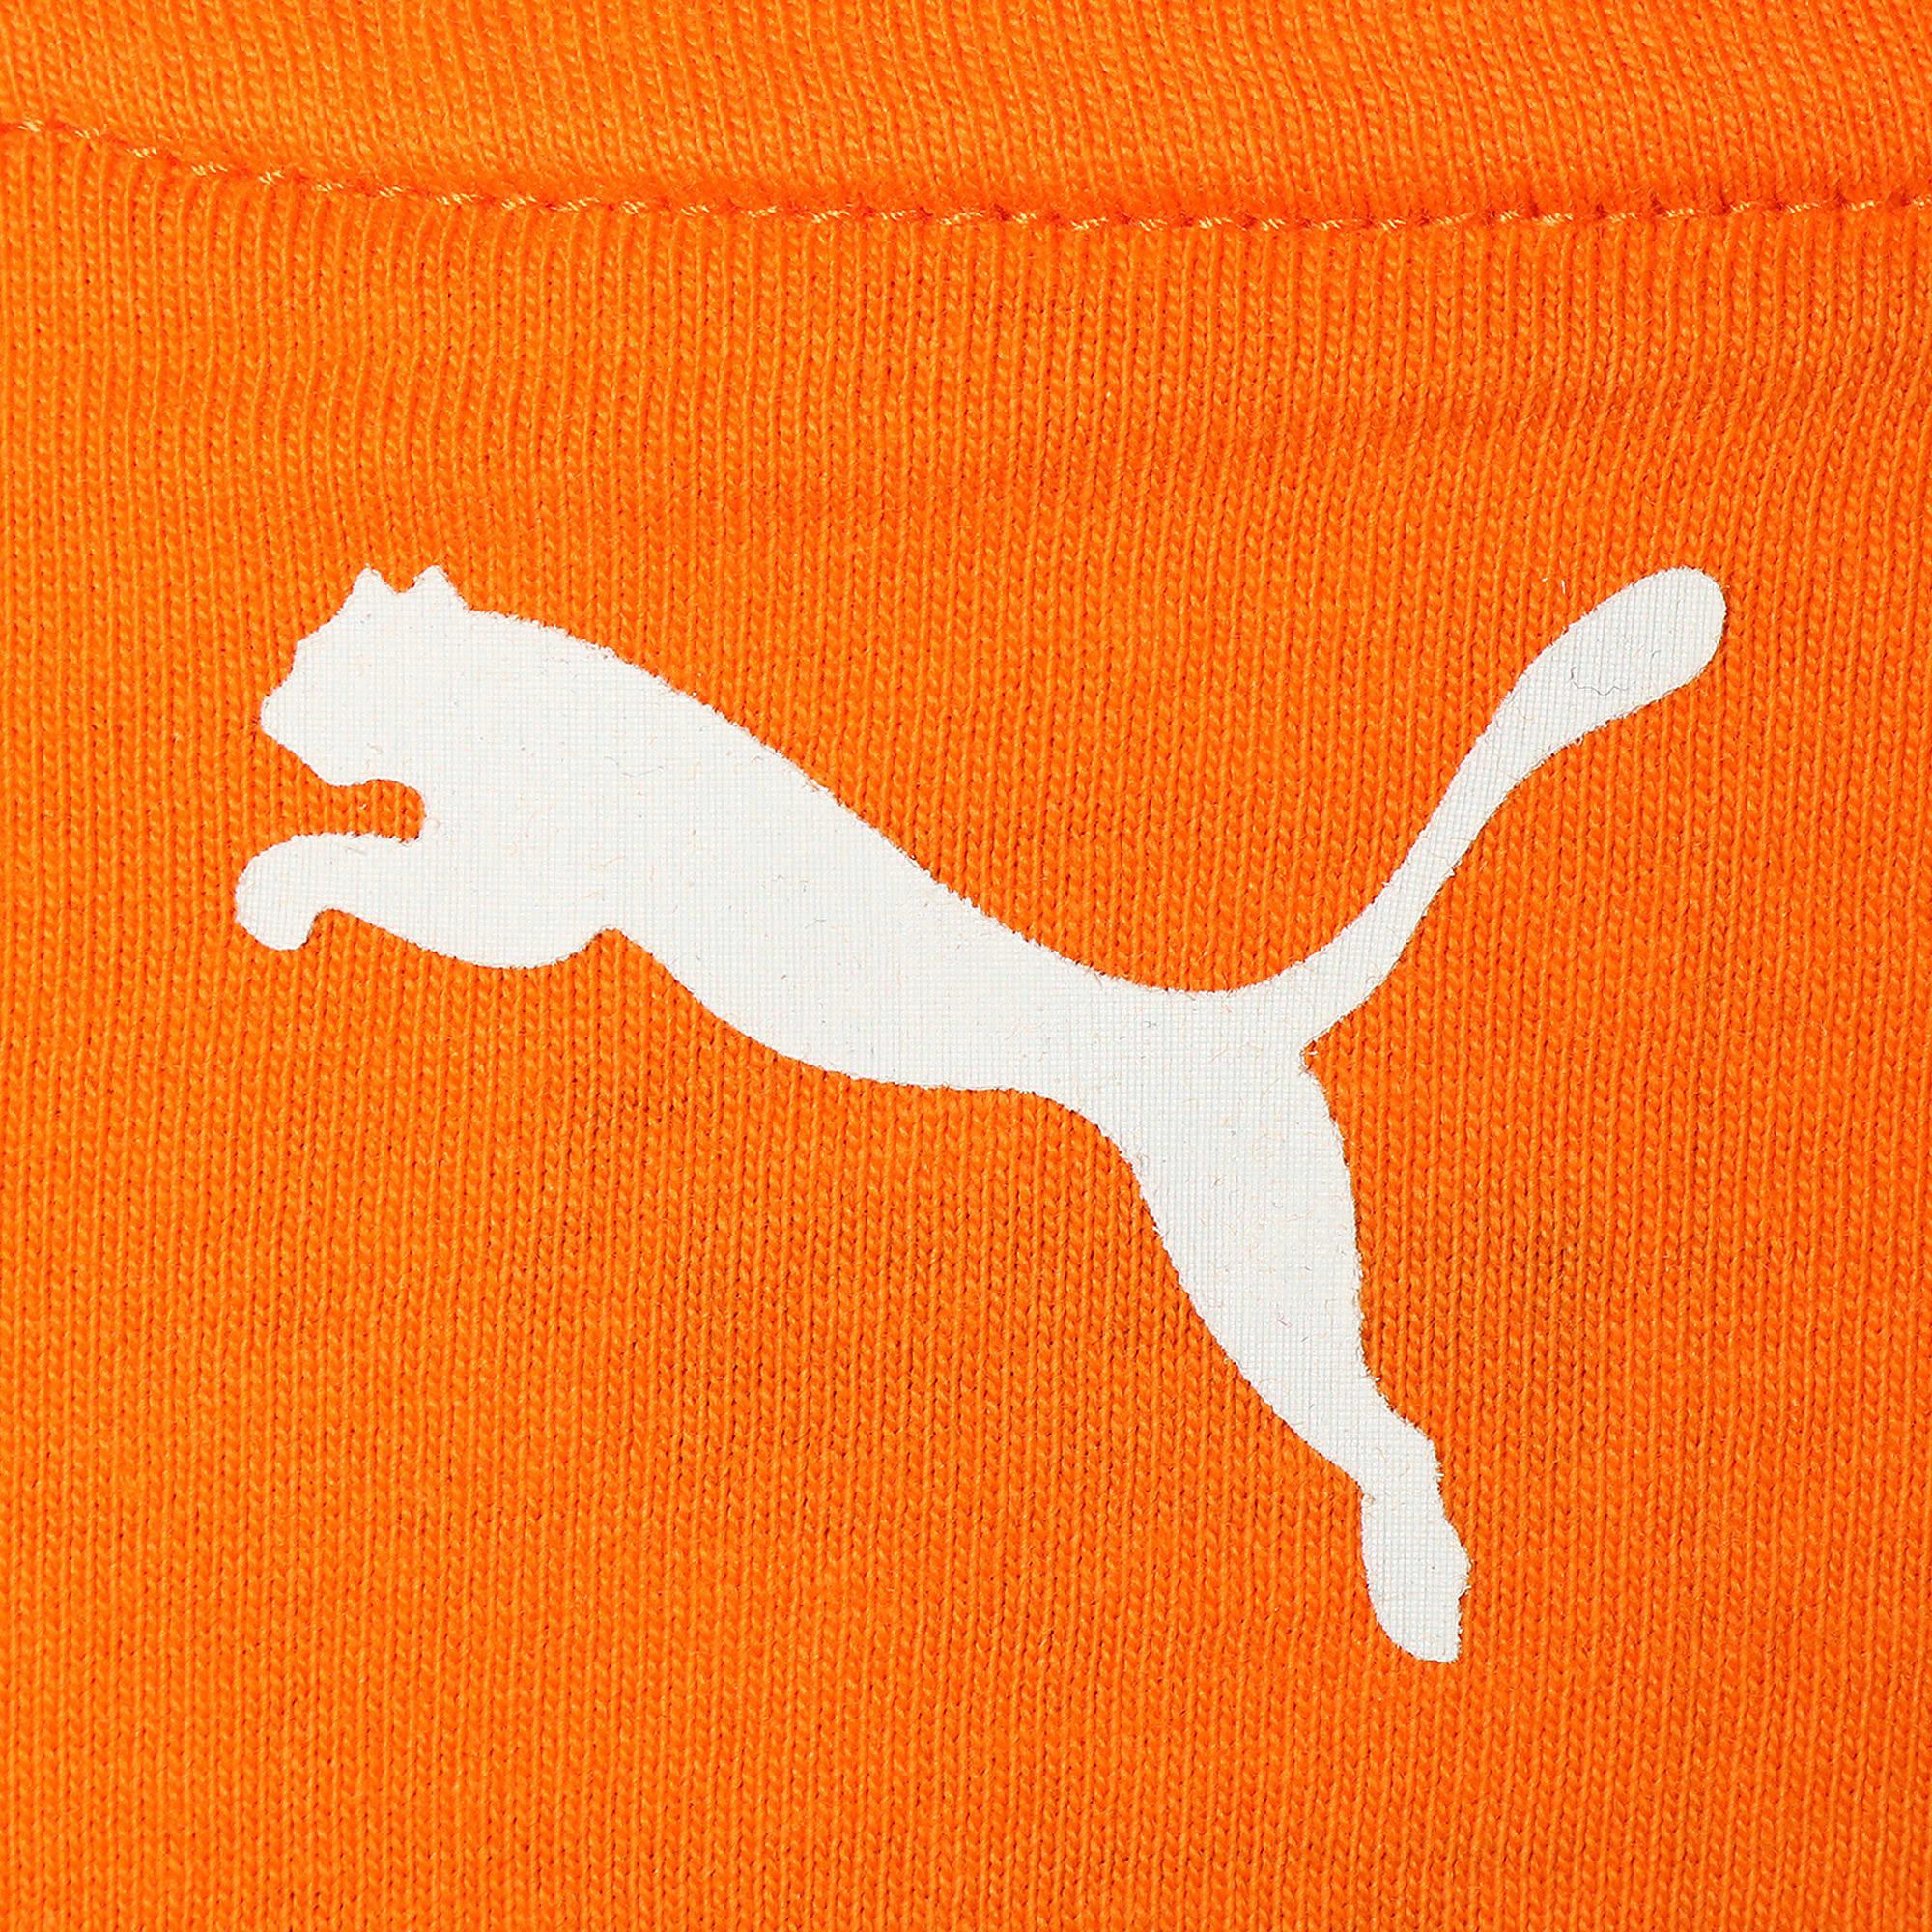 Thumbnail 4 of キッズ ALPHA SS グラフィック Tシャツ 半袖, Orange Popsicle, medium-JPN